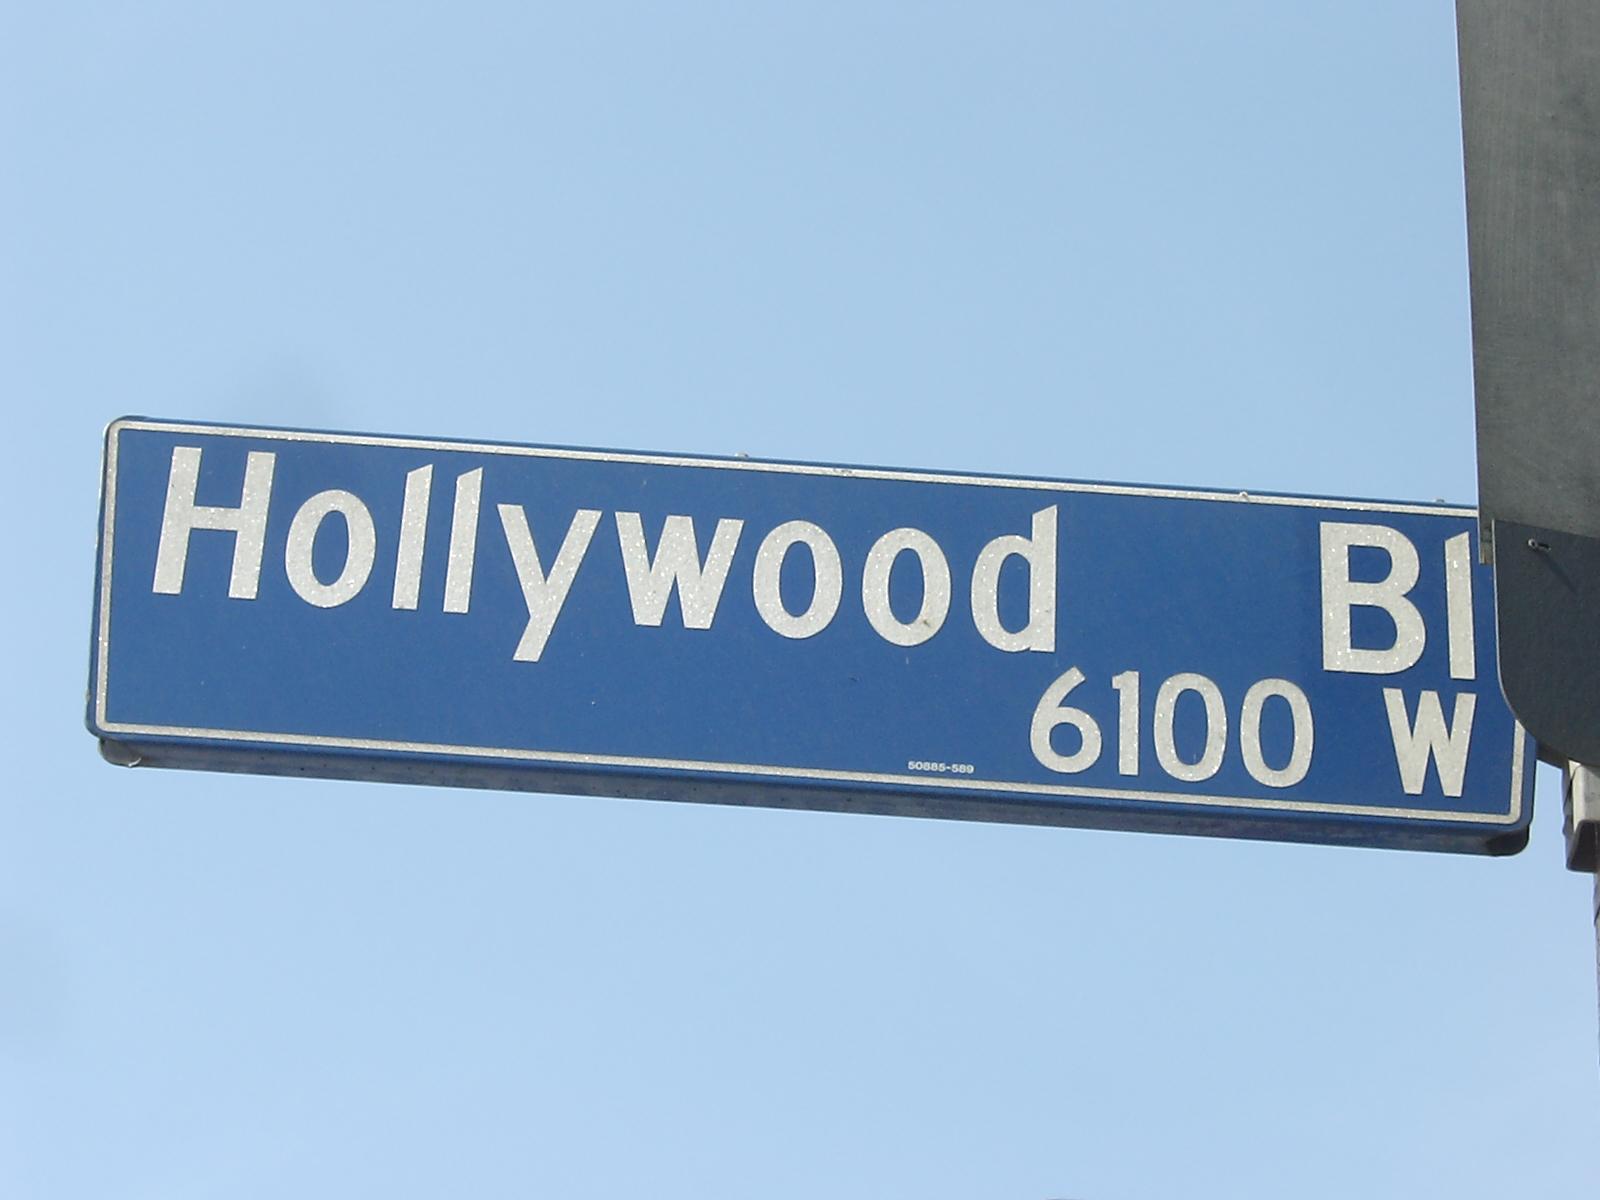 Hollywood Boulevard - Wikipedia